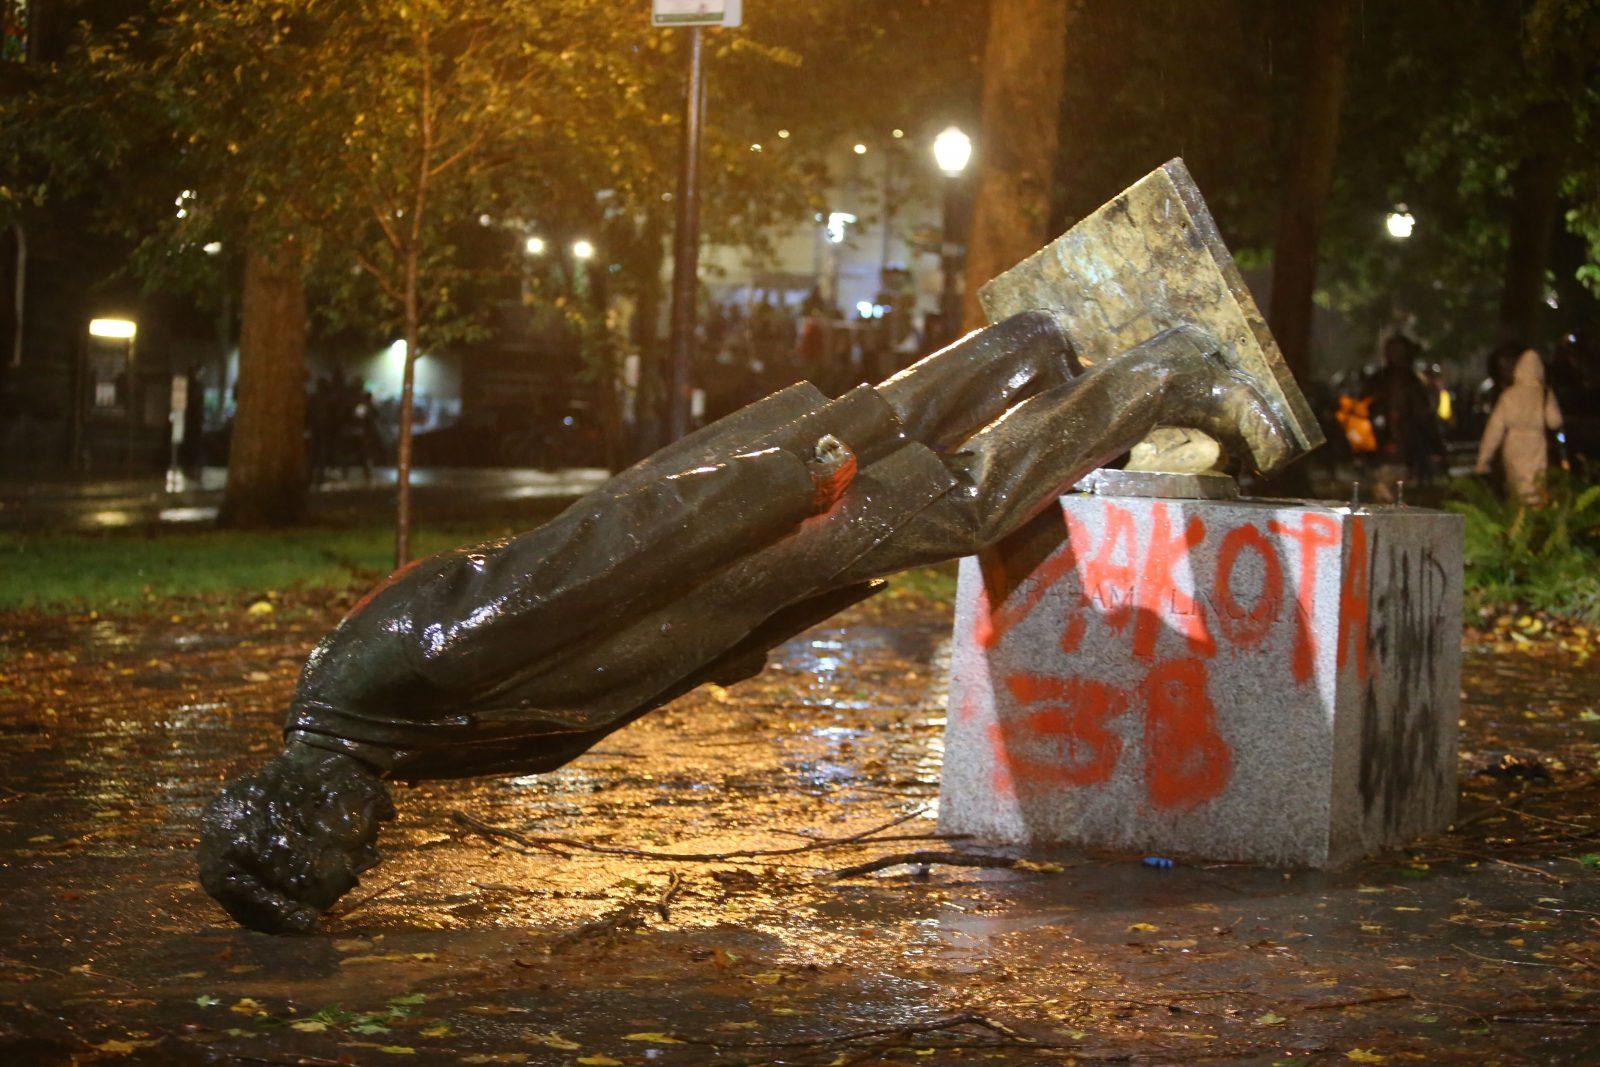 Das zerstörte Lincoln-Denkmal in Portland wurde mit Farbe beschmiert Foto: picture alliance / AP Photo